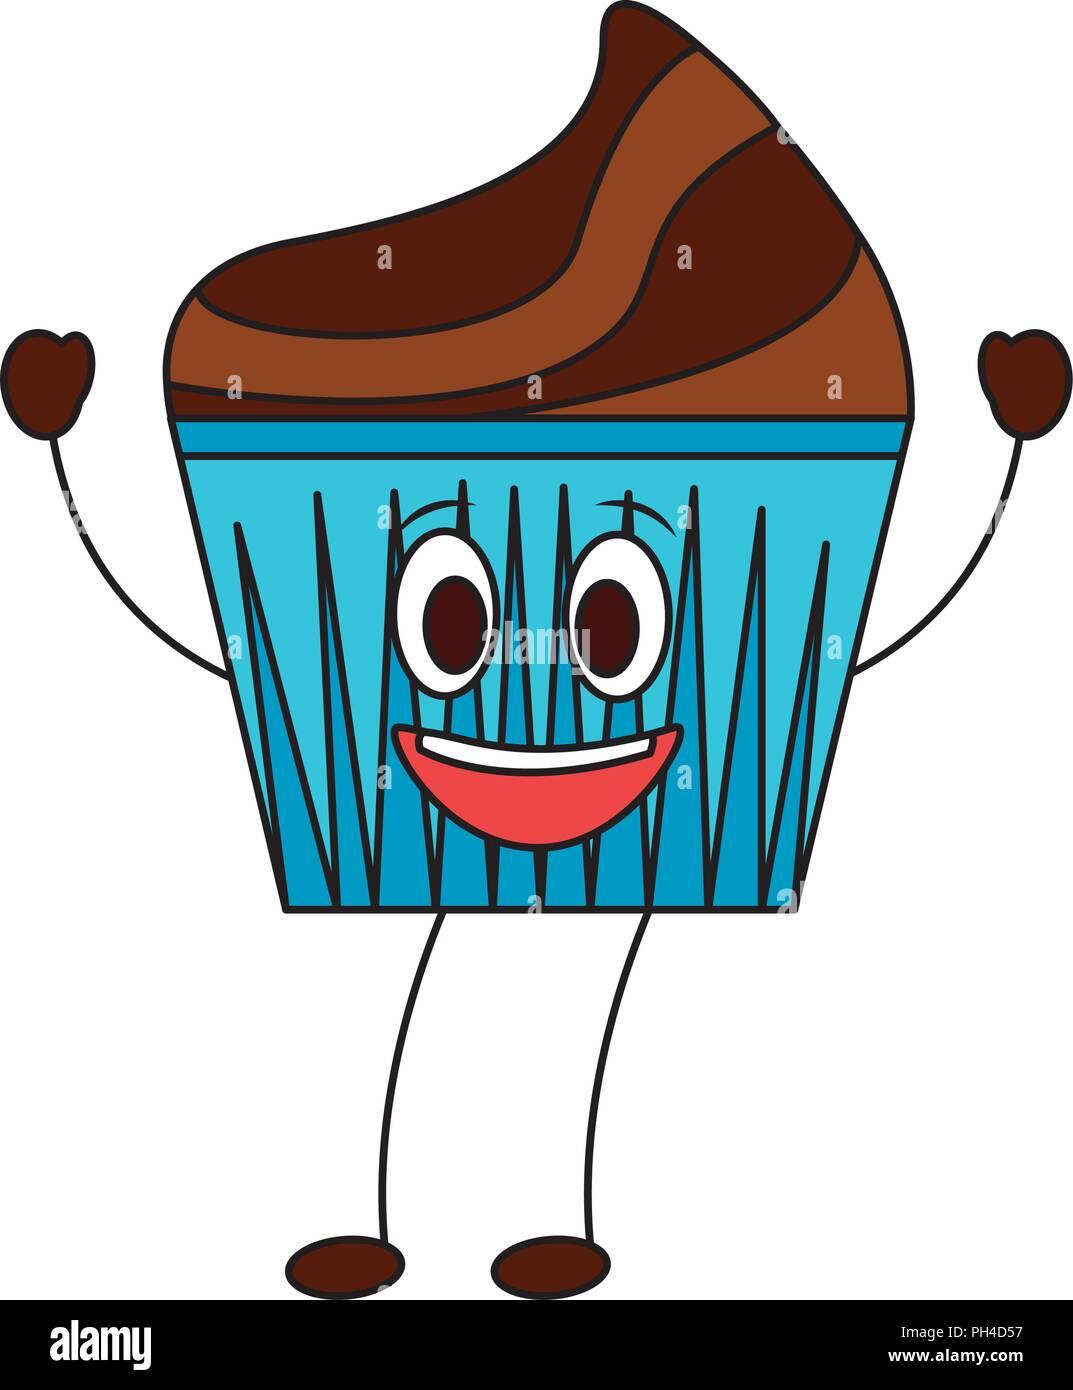 Muffin Kawaii Cara Dibujos Animados Feliz Imágenes De Stock Muffin